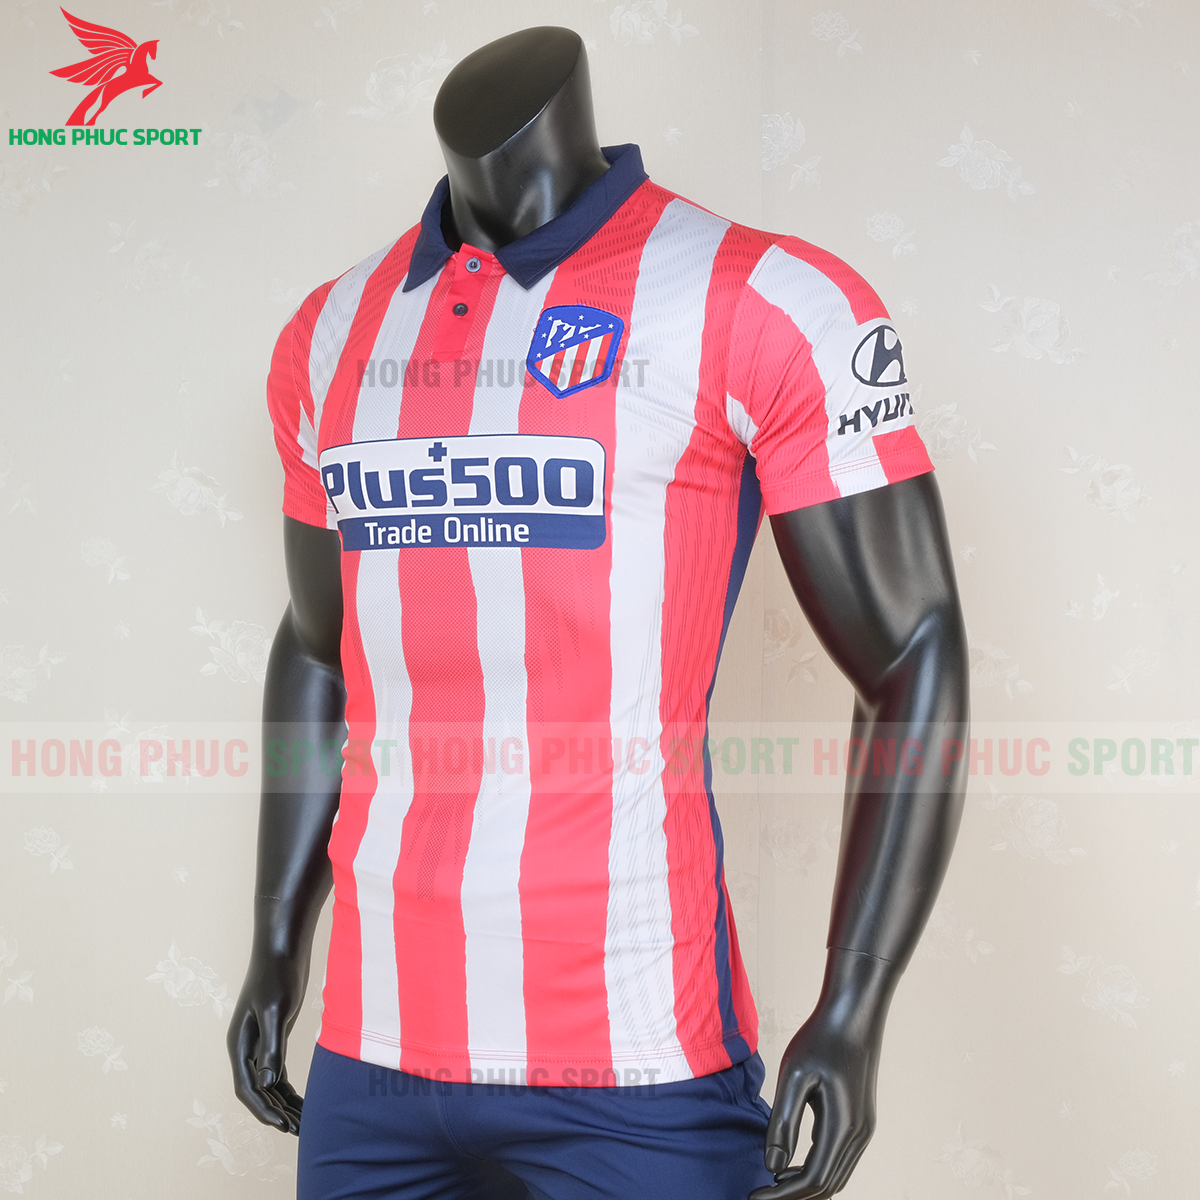 https://cdn.hongphucsport.com/unsafe/s4.shopbay.vn/files/285/ao-bong-da-atletico-madrid-2020-2021-san-nha-4-5f6c7ba893170.png